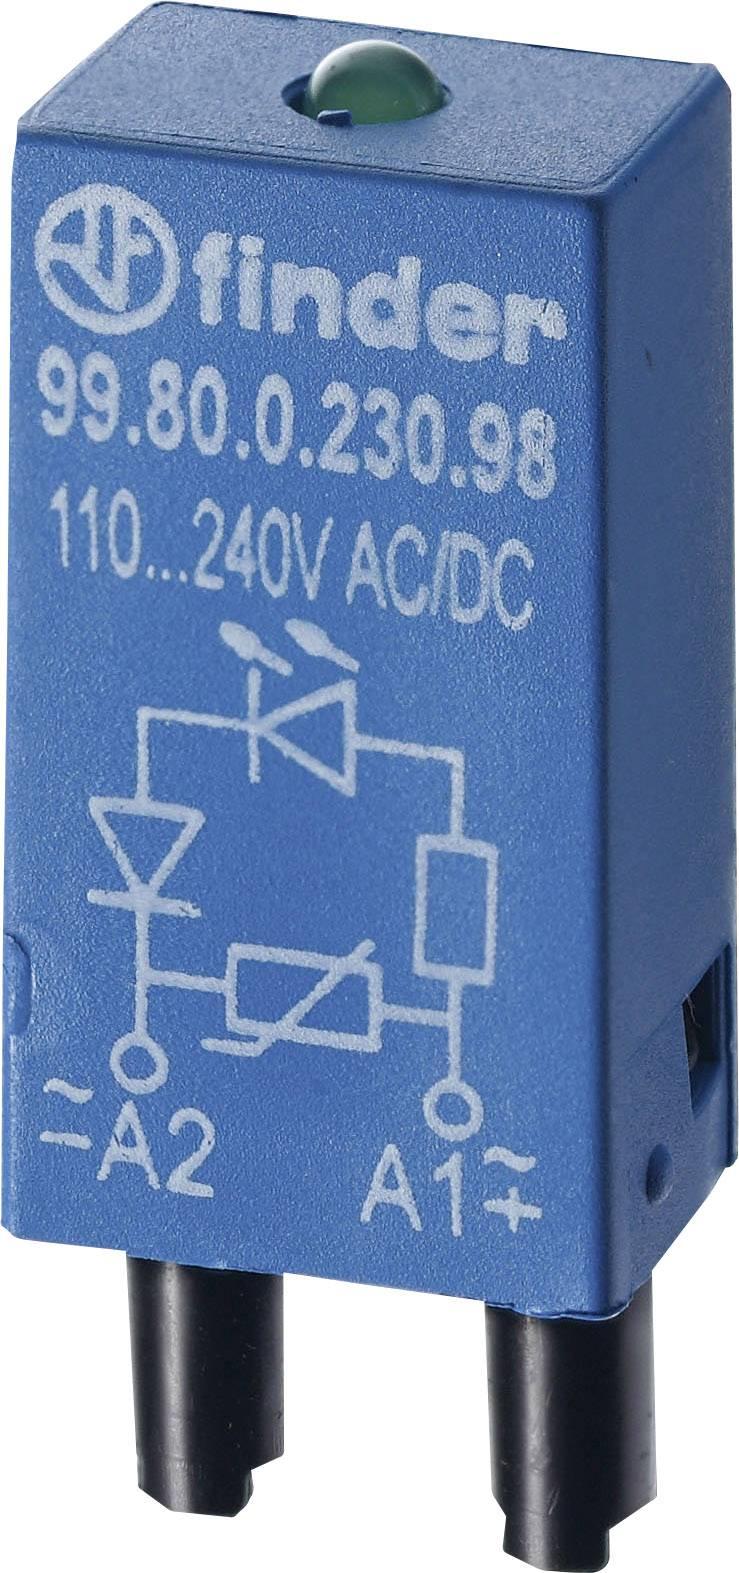 Zasúvací modul s diódou Finder 99.80.0.230.98 Farba svetla: zelená